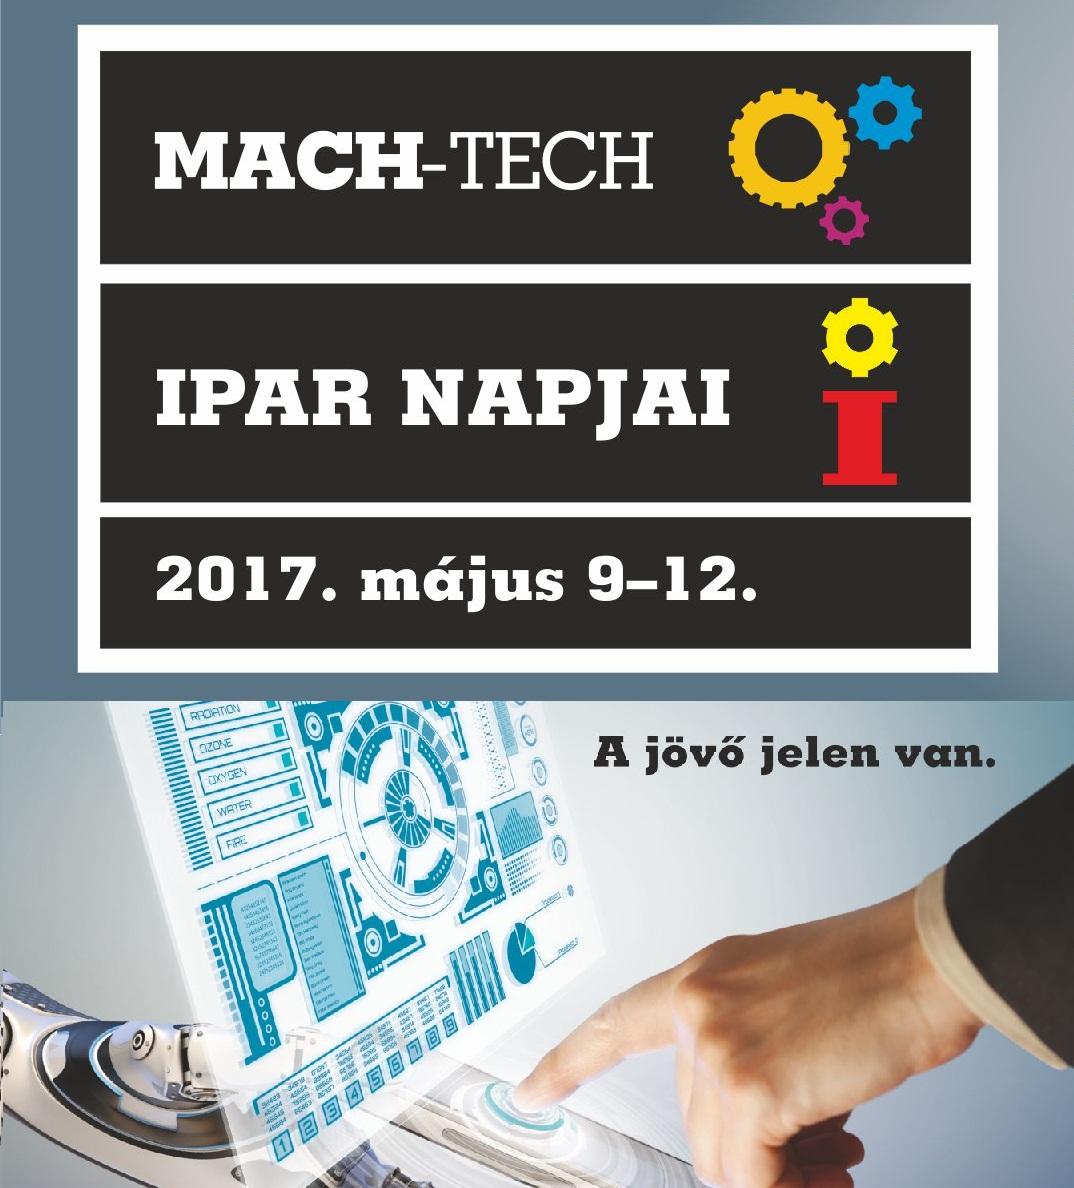 Meghívó: Ipar Napjai – MachTech 2017.05.09-12.